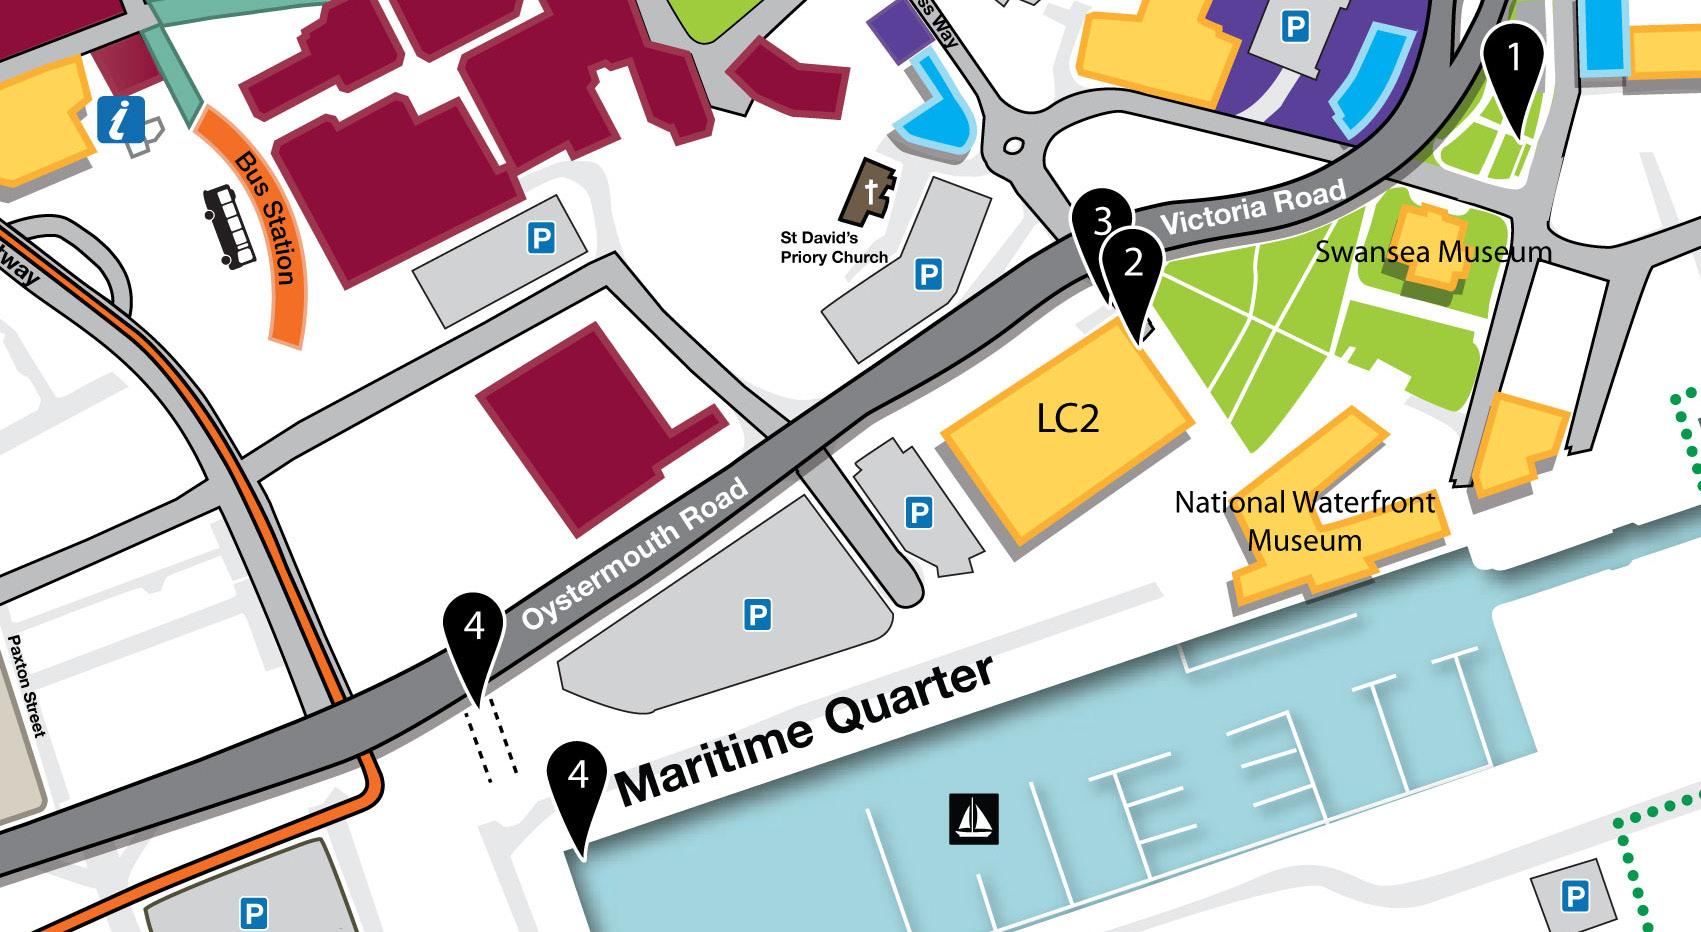 <i><b>Image:</b> Plan showing locations of artworks along Swansea Boulevard. </i>